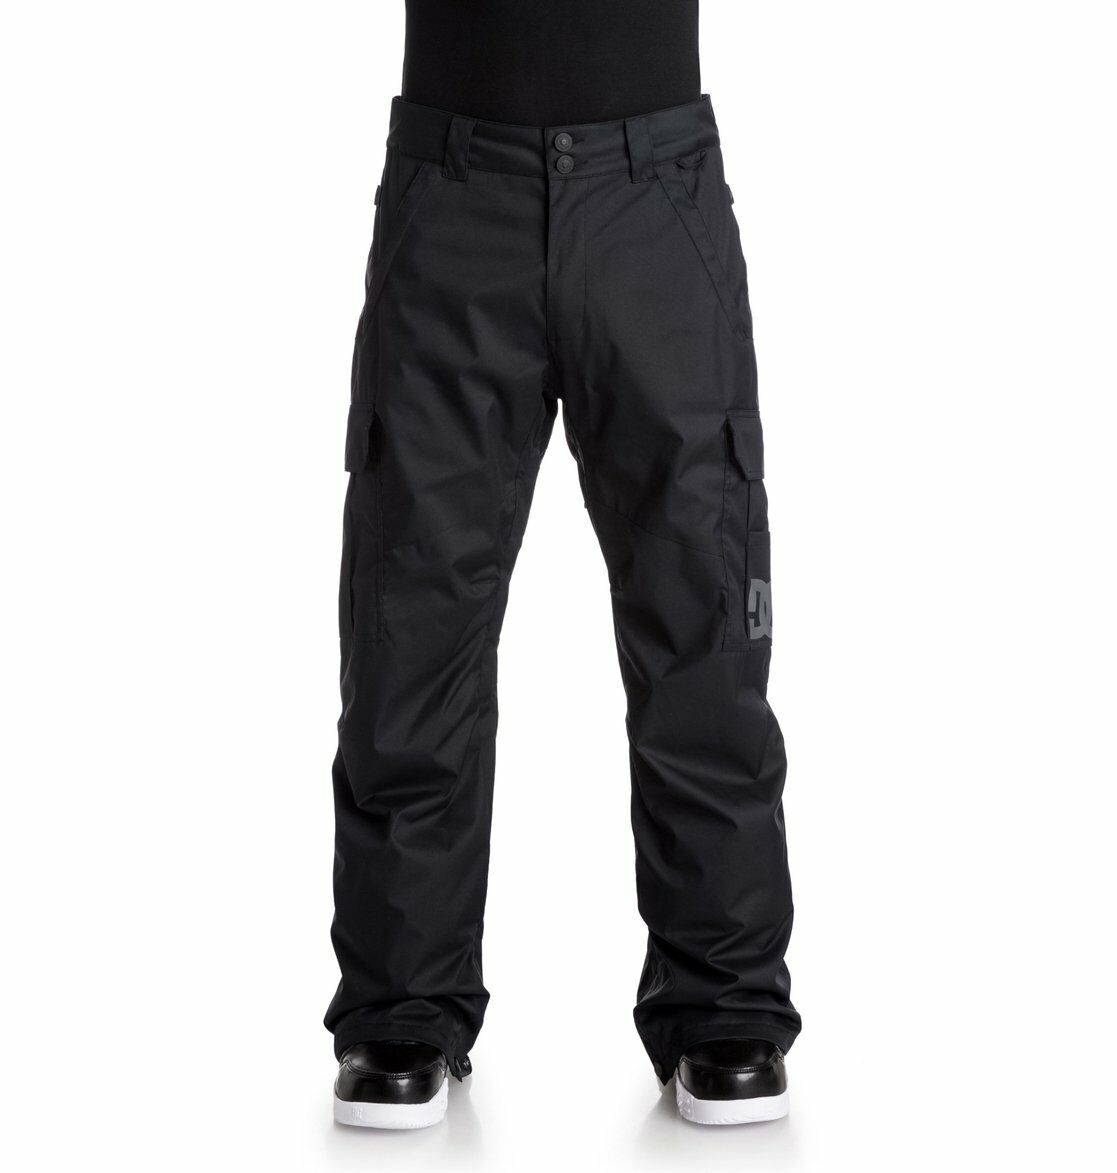 Pantaloni Uomo da Snowboard DC Shoes Banshee Nero Black Sci Montagna Inverno